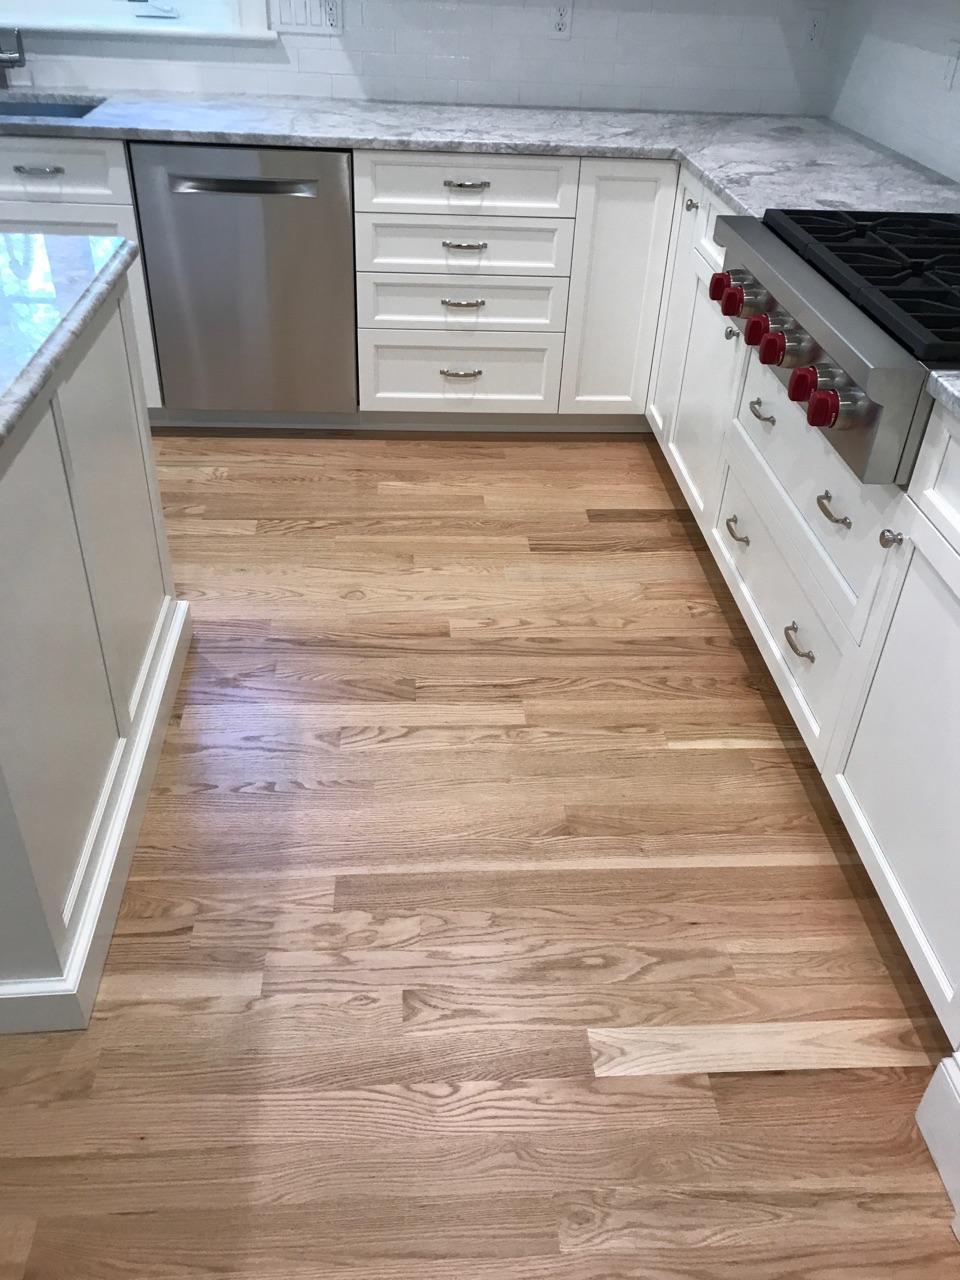 3 Inch Red Oak Floors